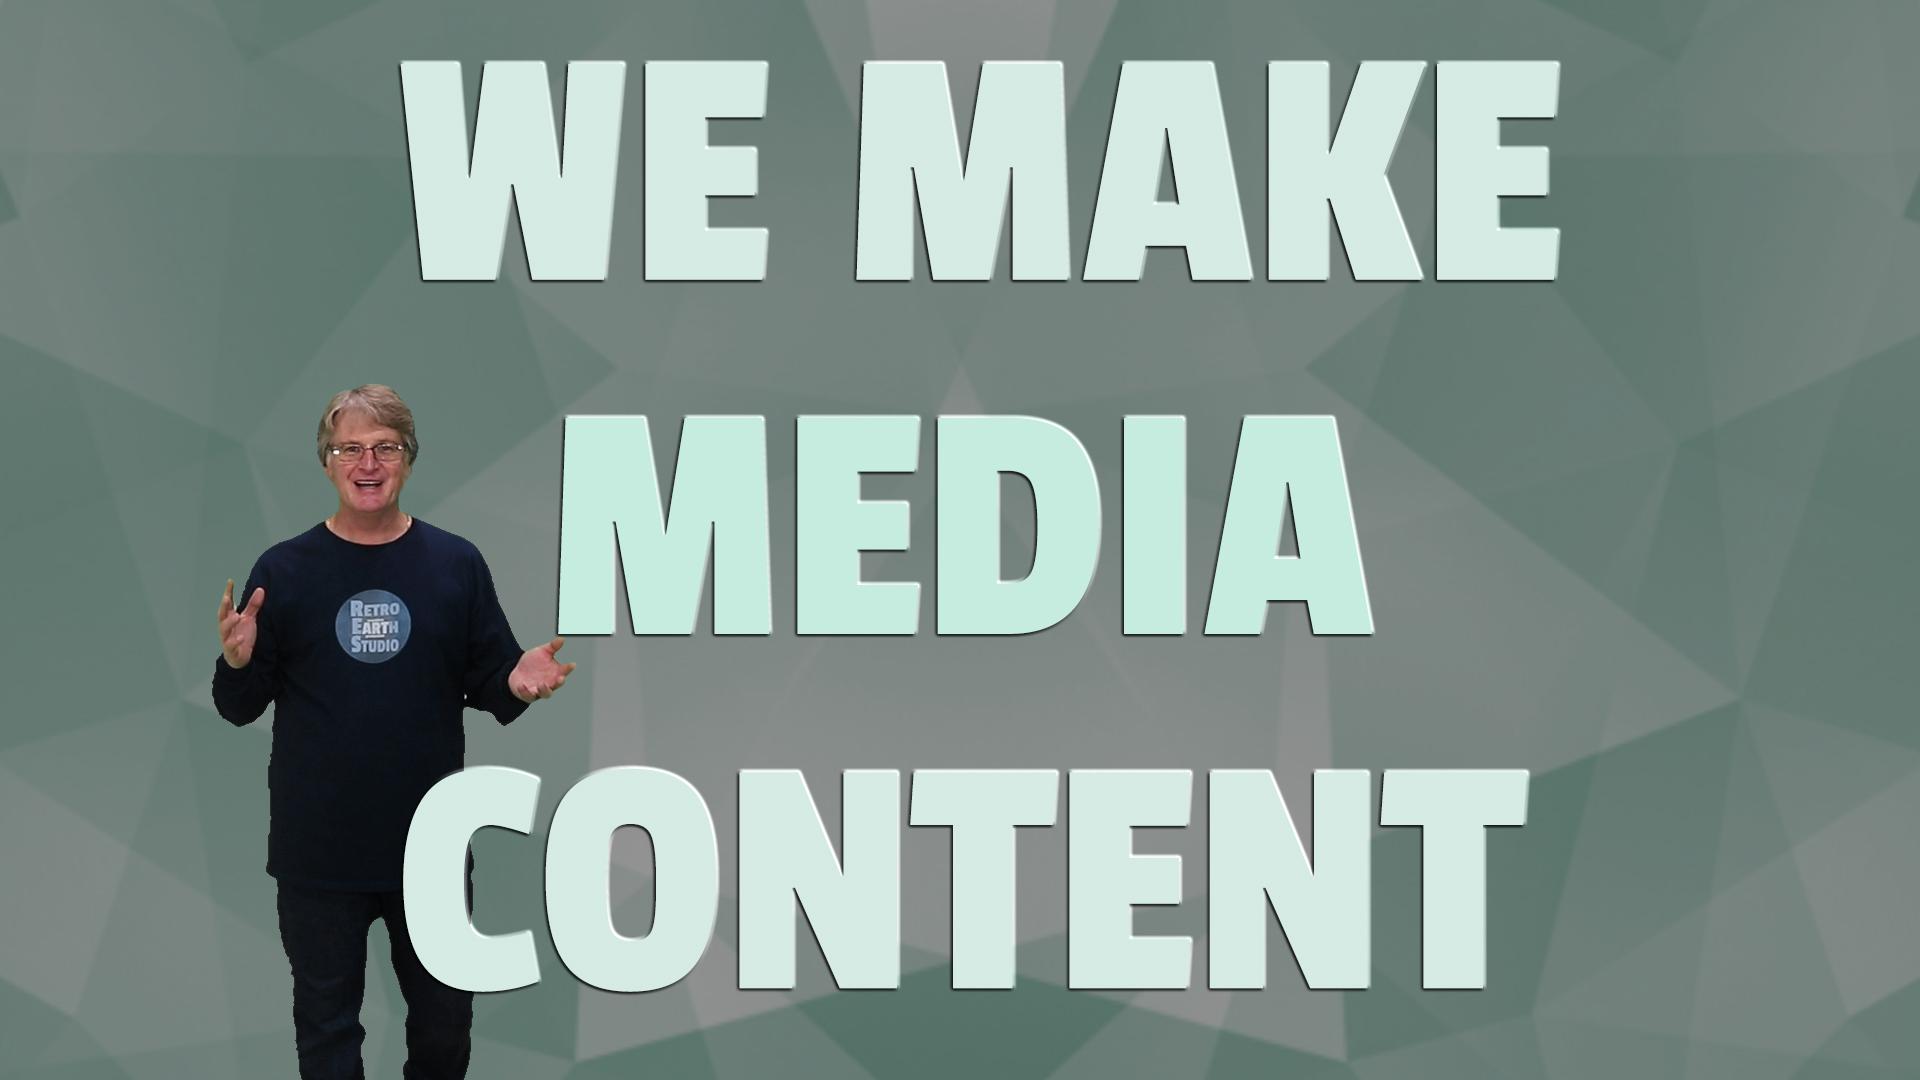 Brand Marketing Samples | Media Library